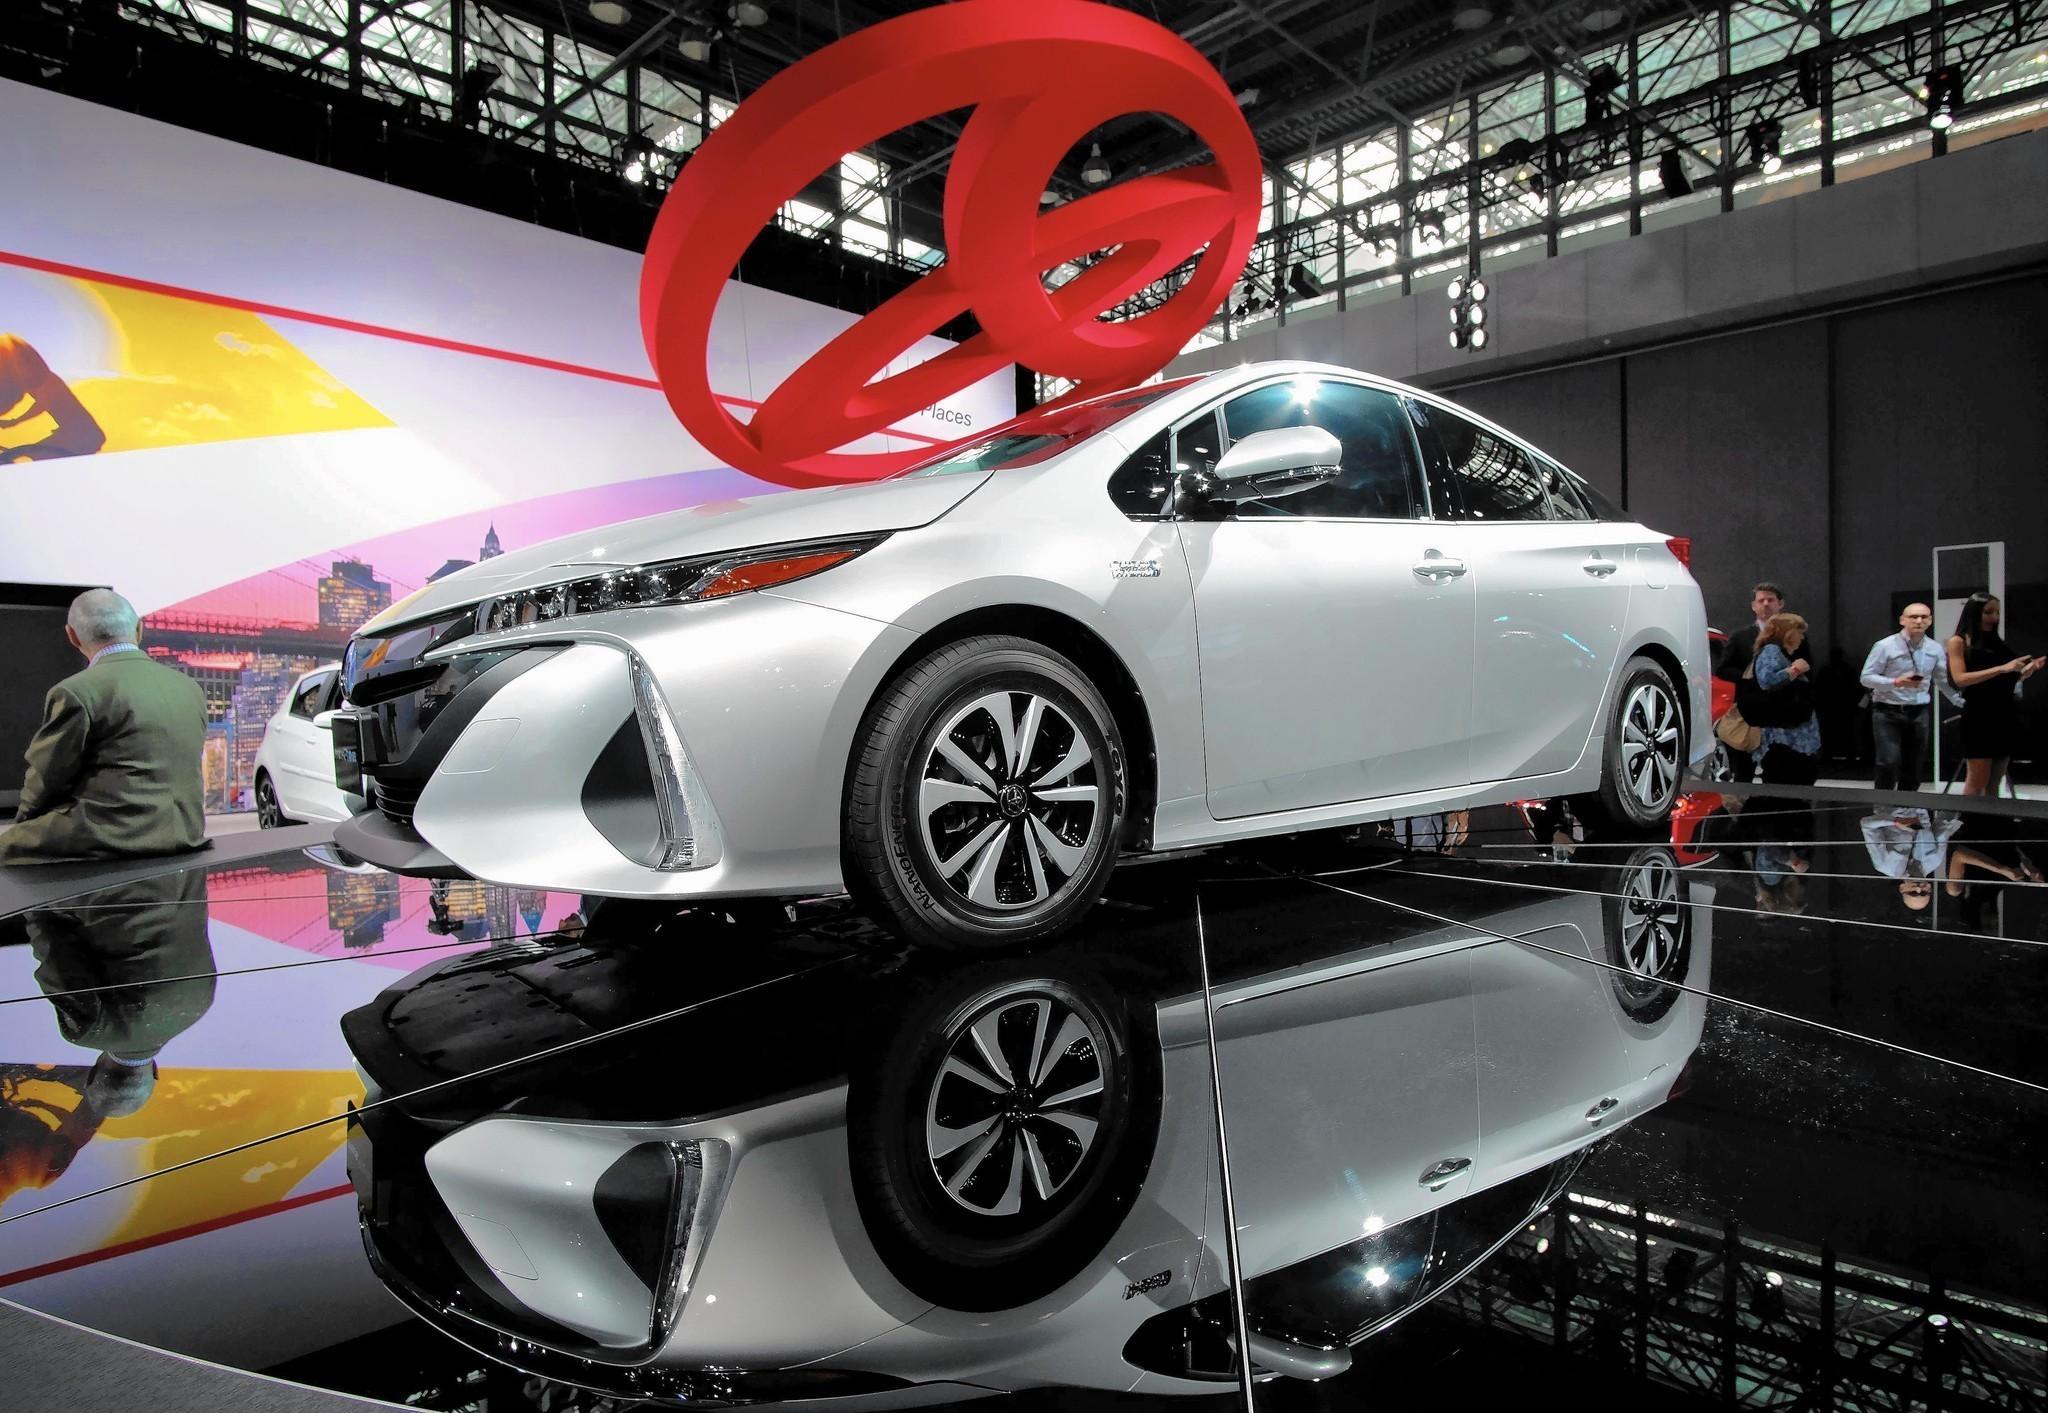 Toyota unveils four new models prius prime highlander suv 86 sports coupe corolla chicago tribune